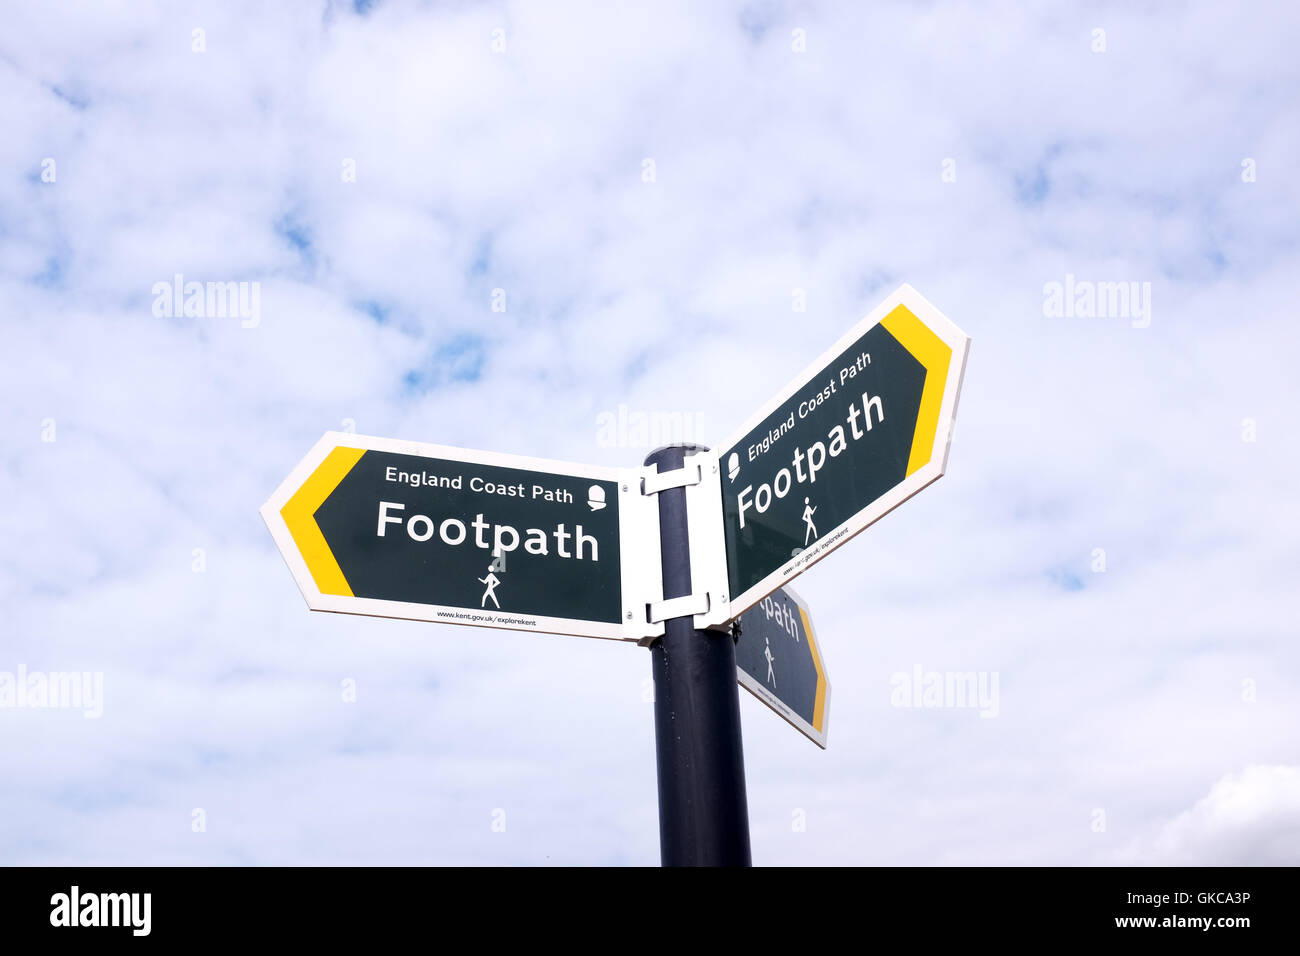 View across Dungeness Kent UK -- England Coast Path sign - Stock Image